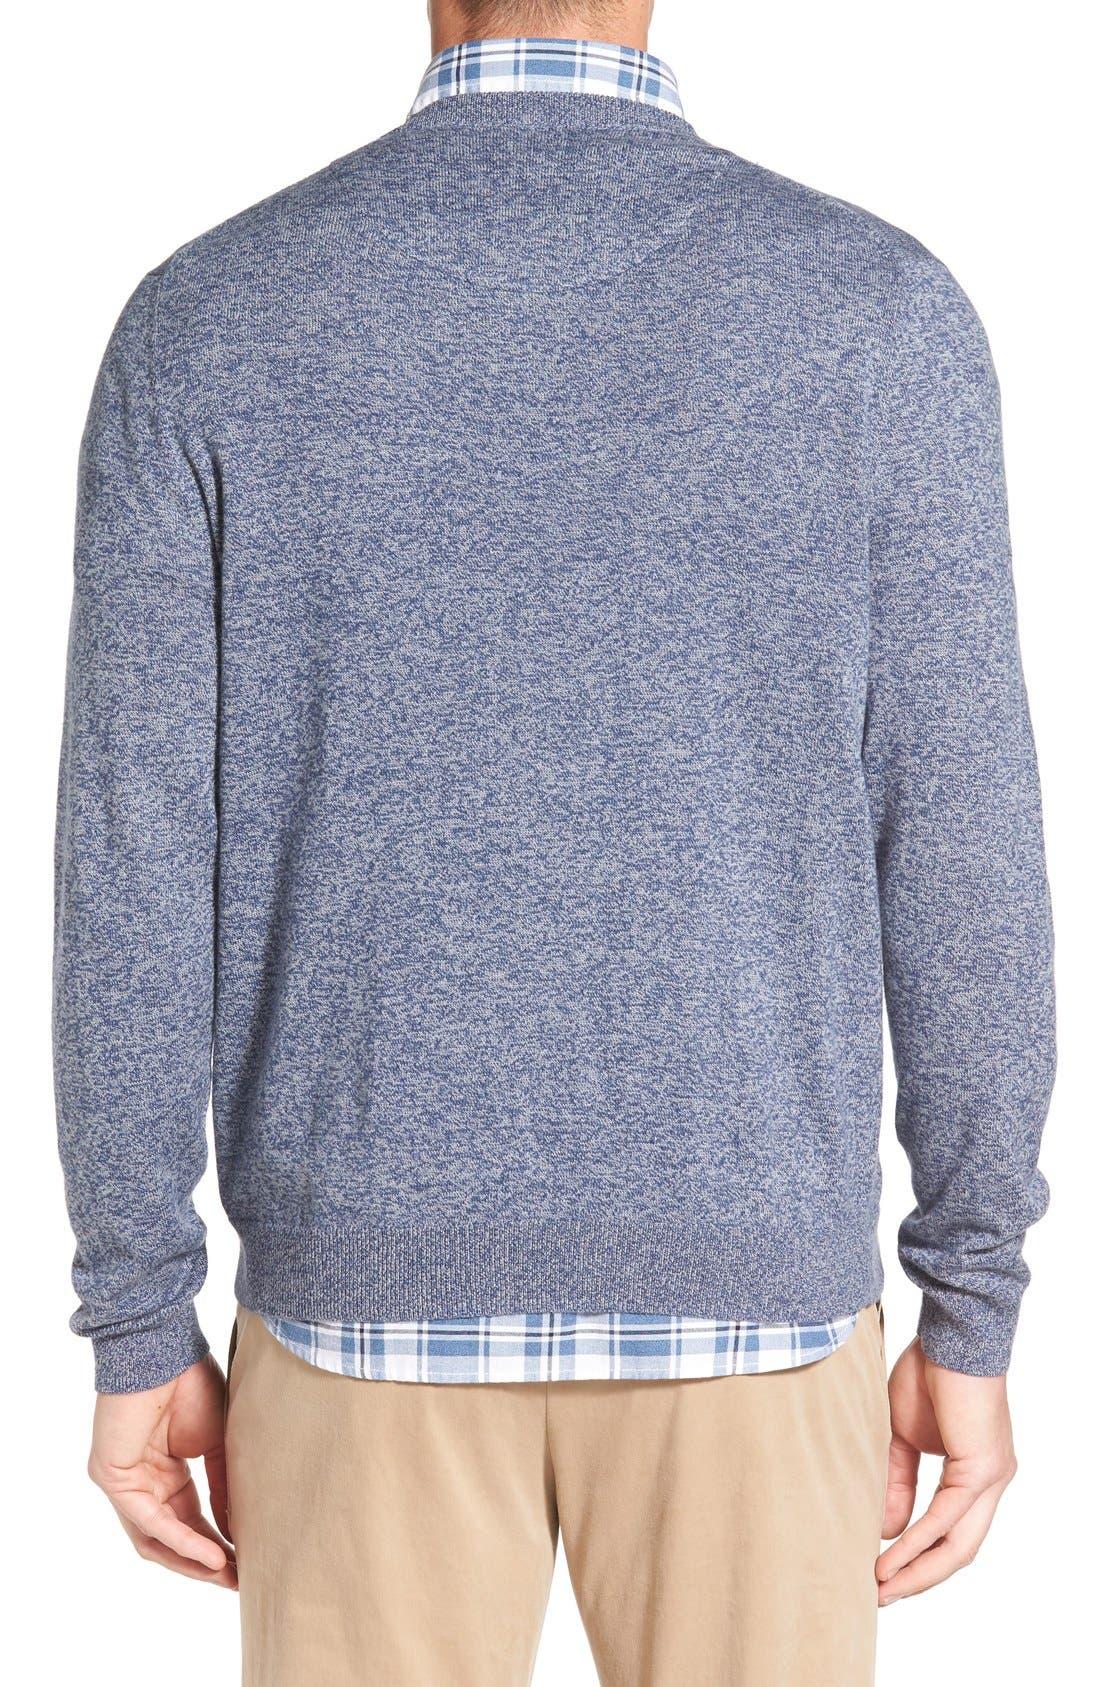 Cotton & Cashmere V-Neck Sweater,                             Alternate thumbnail 2, color,                             Blue Estate Jaspe